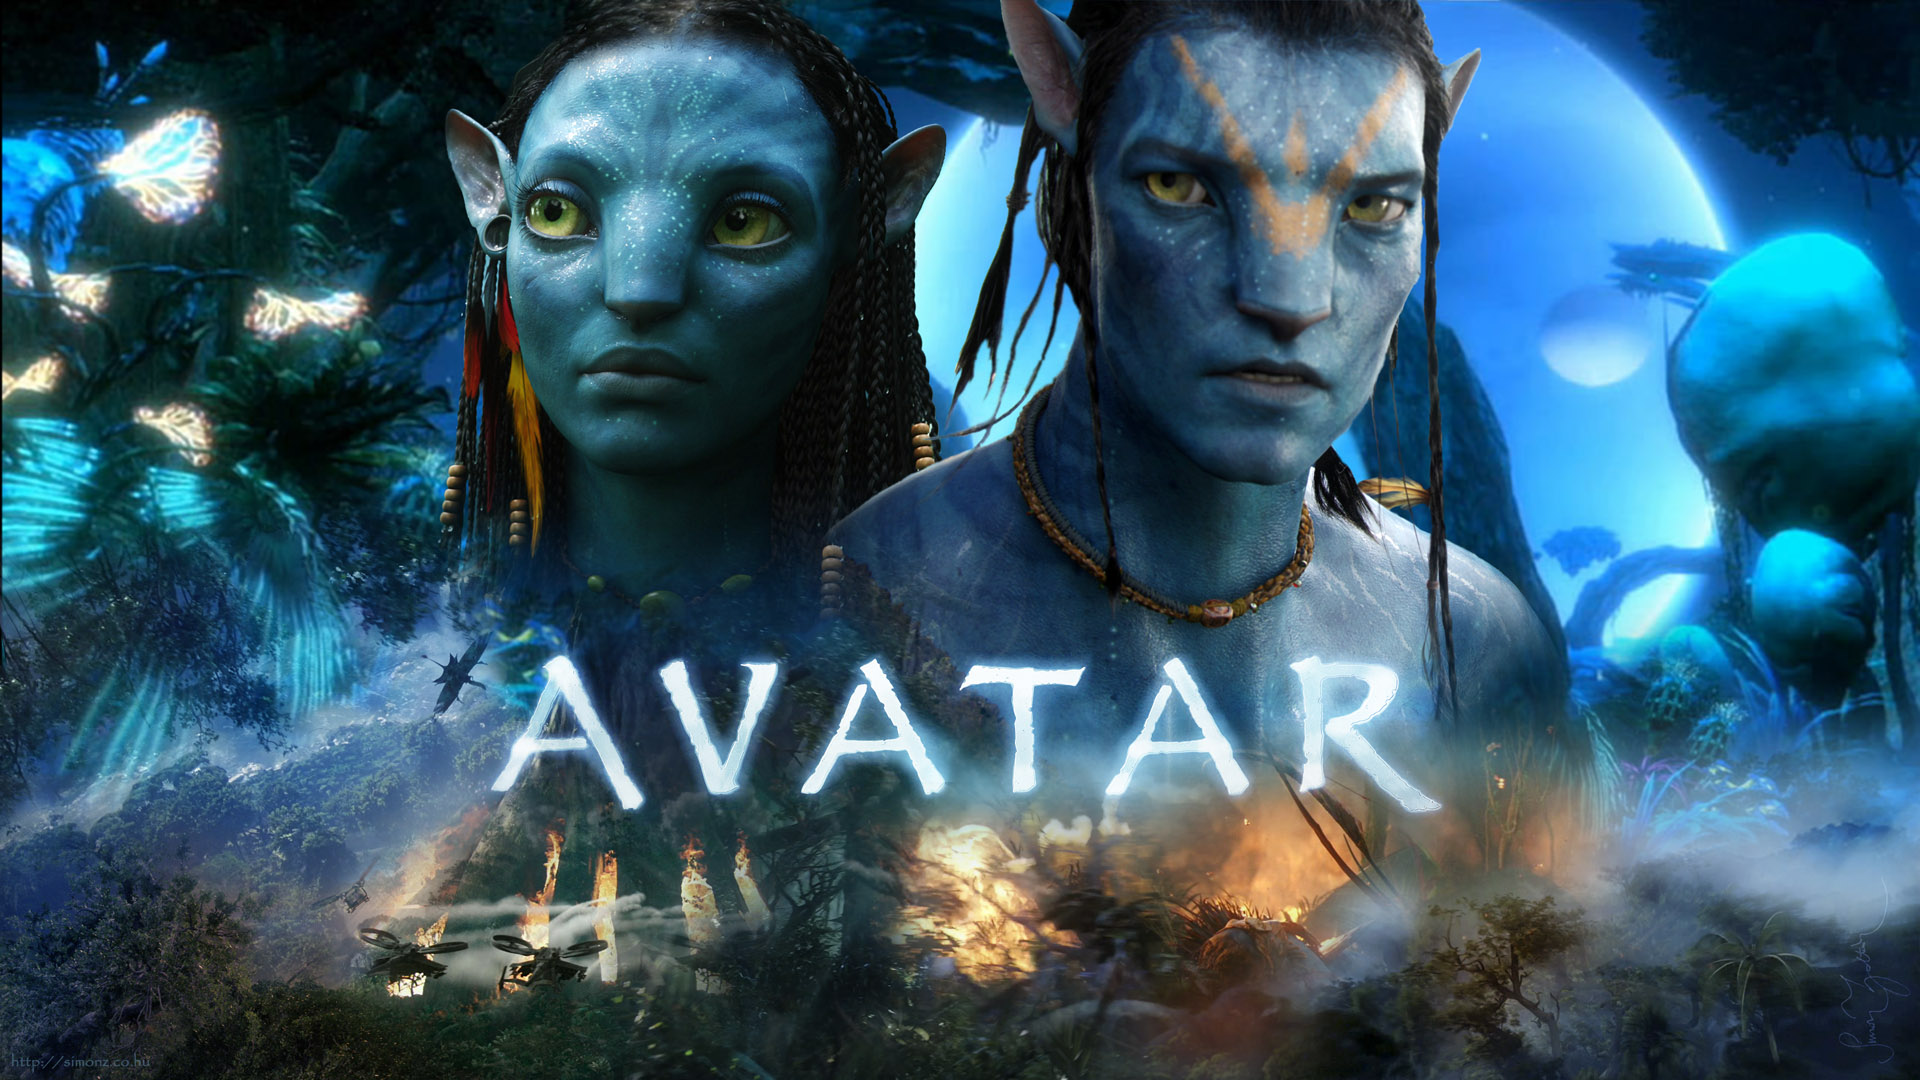 avatar-wallp-1920x1080[1]